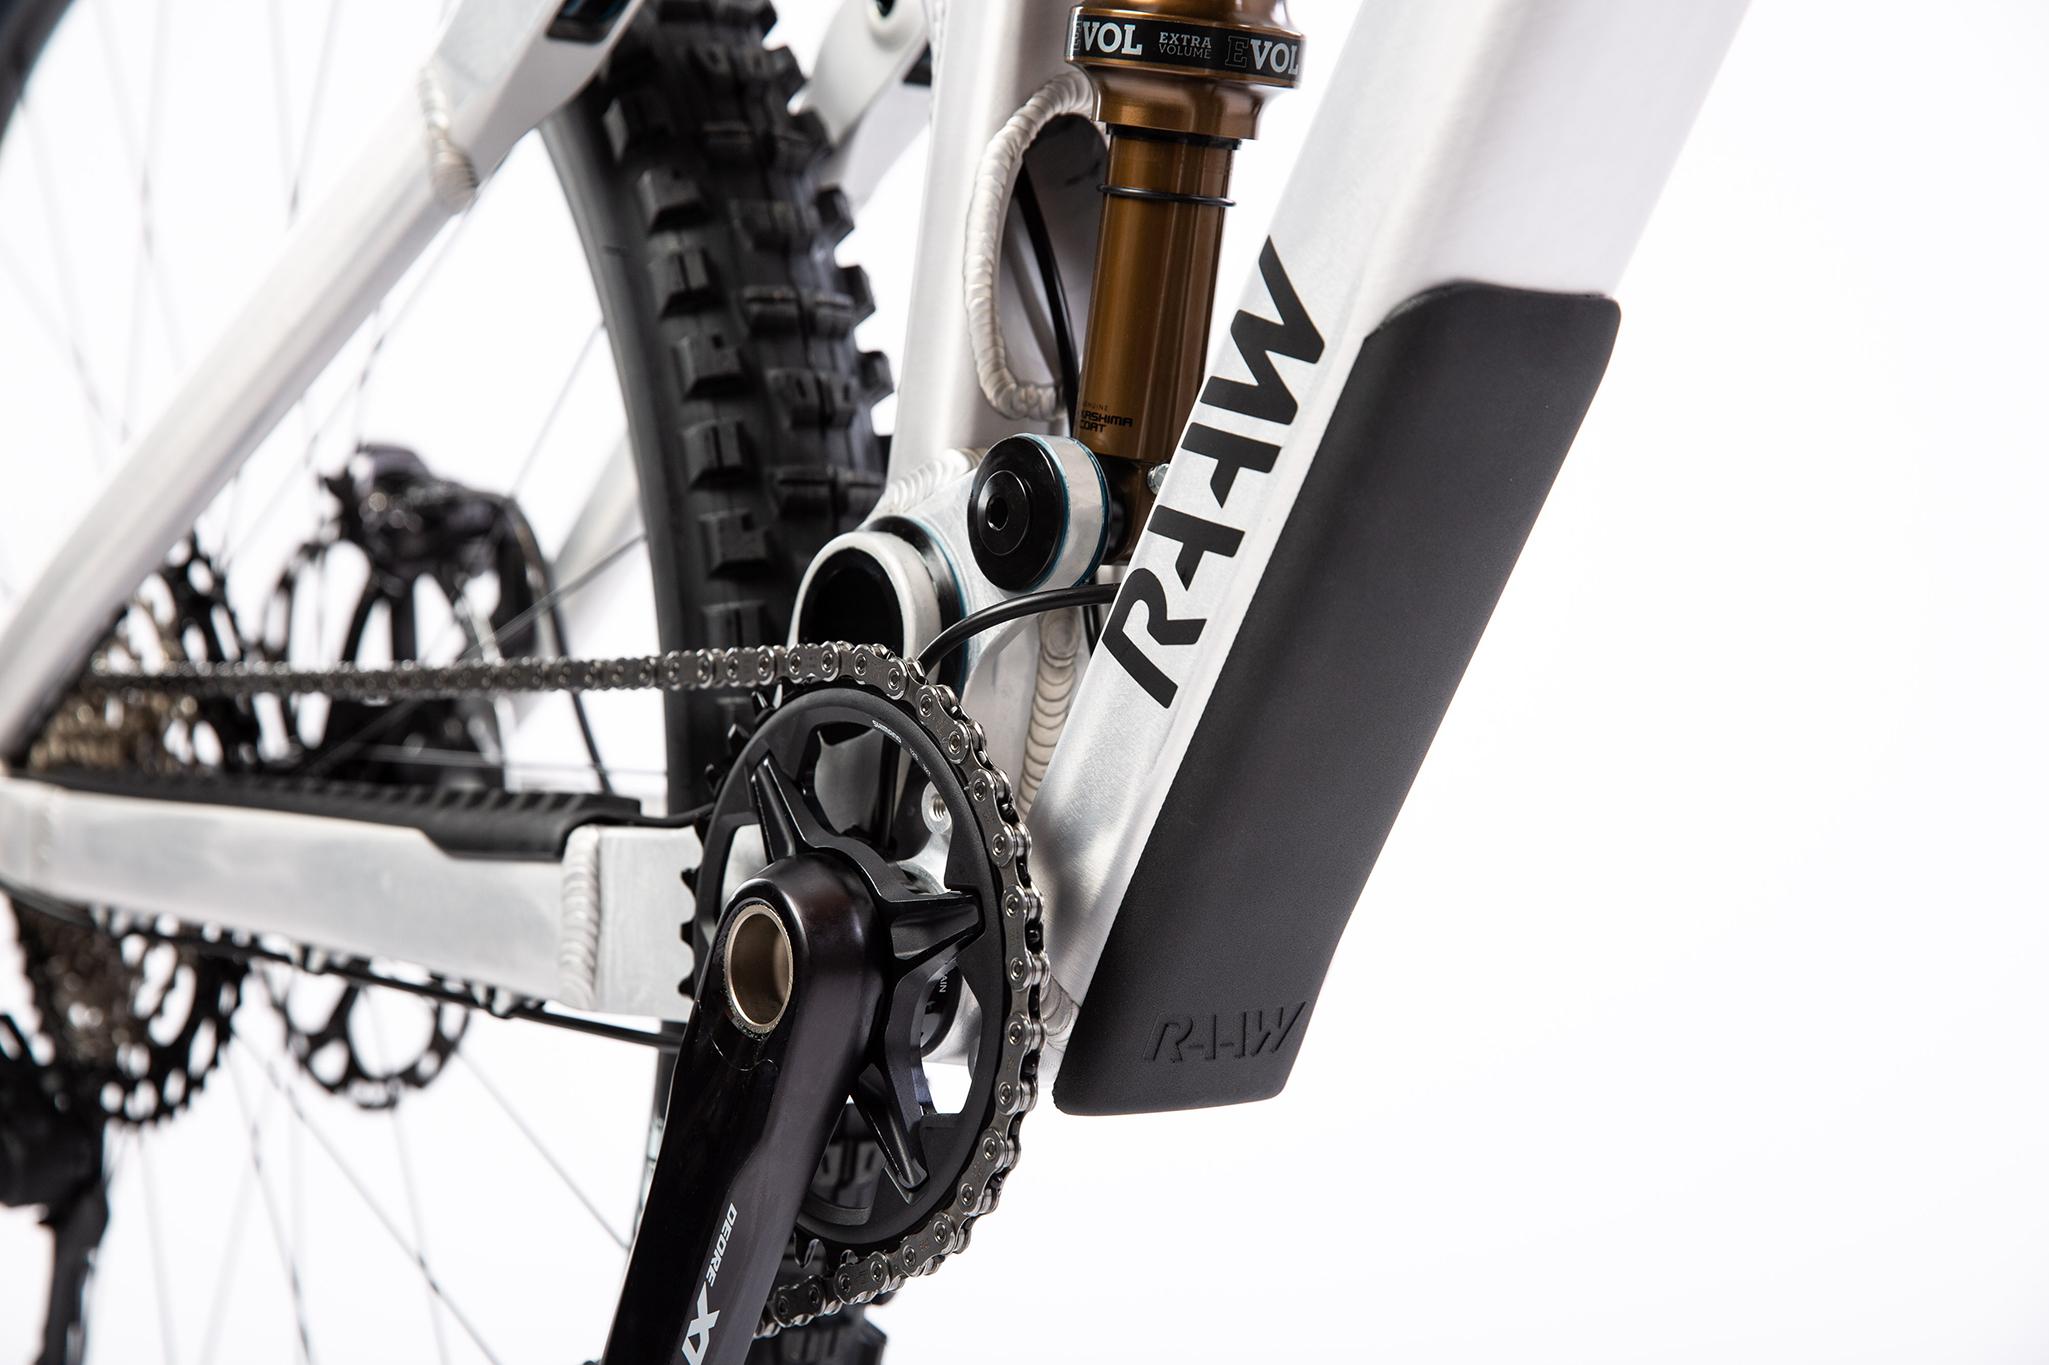 RAAW Madonna V2 11 Cycleholix